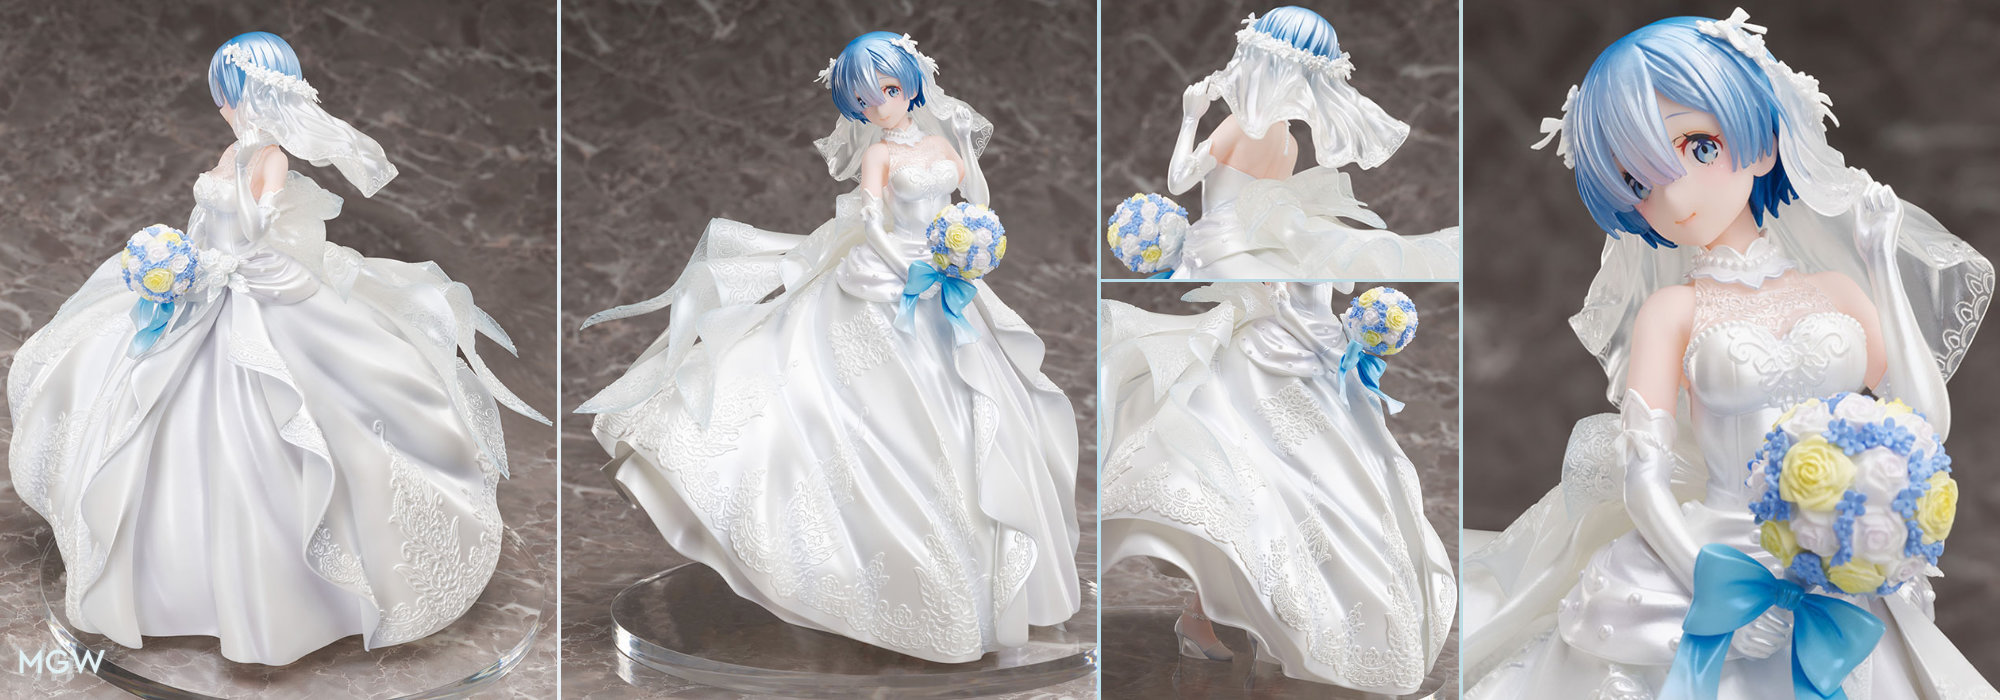 Rem Wedding Dress by FuRyu from ReZERO Starting Life in Another World MyGrailWatch Anime Figure Guide